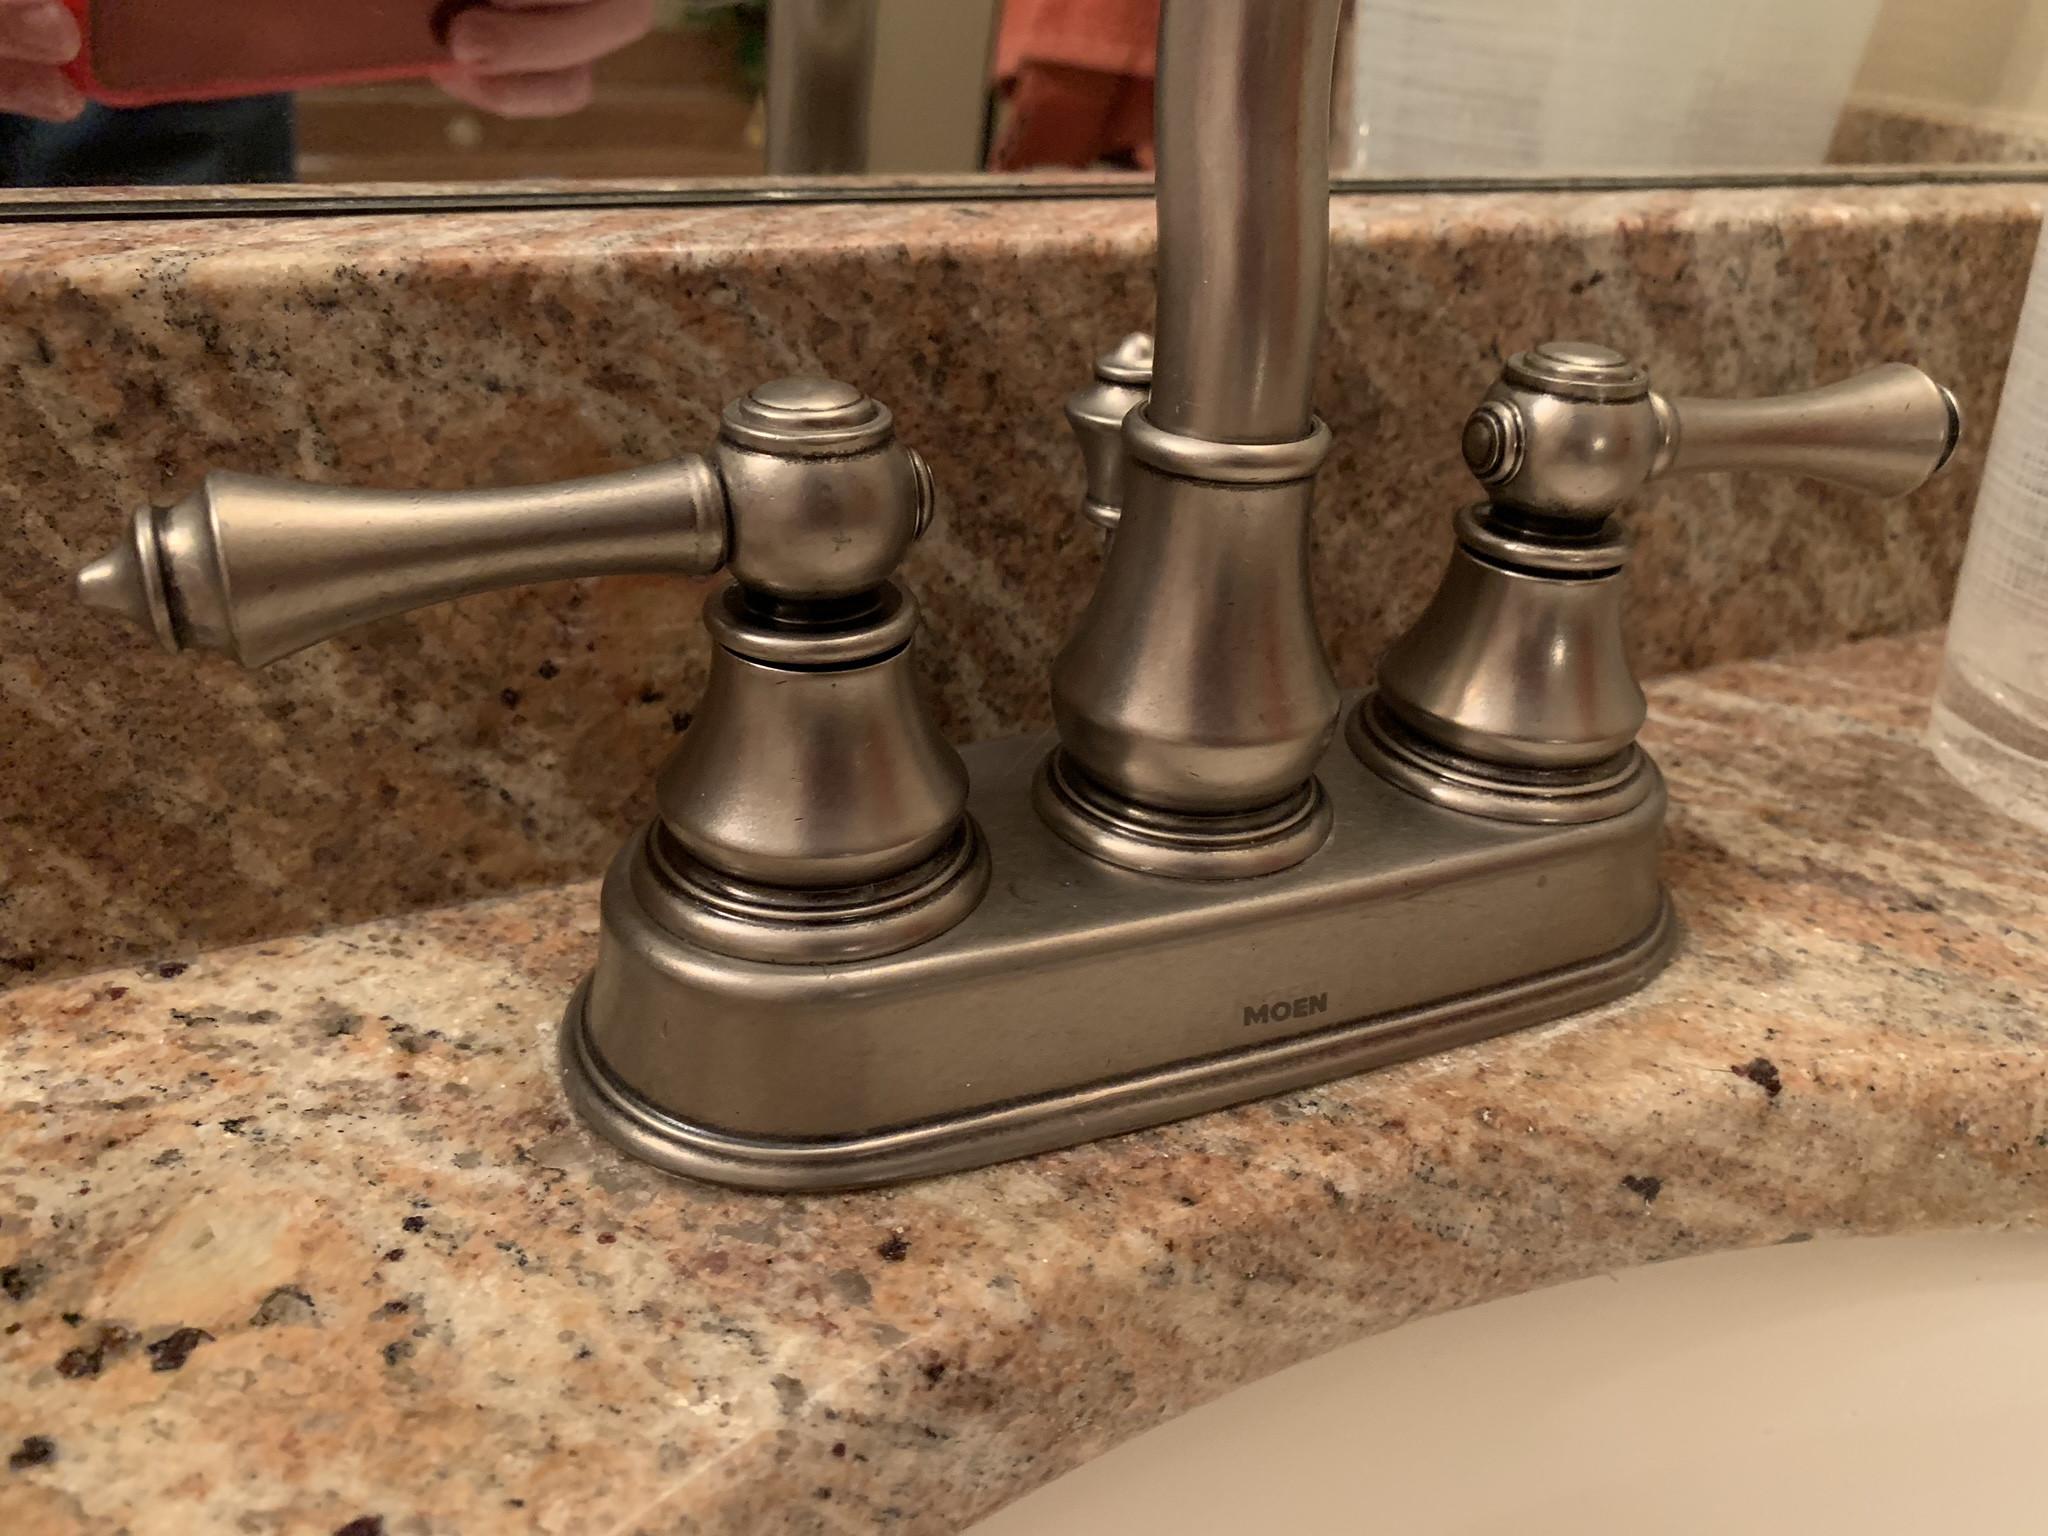 moen bathroom faucet handle removal